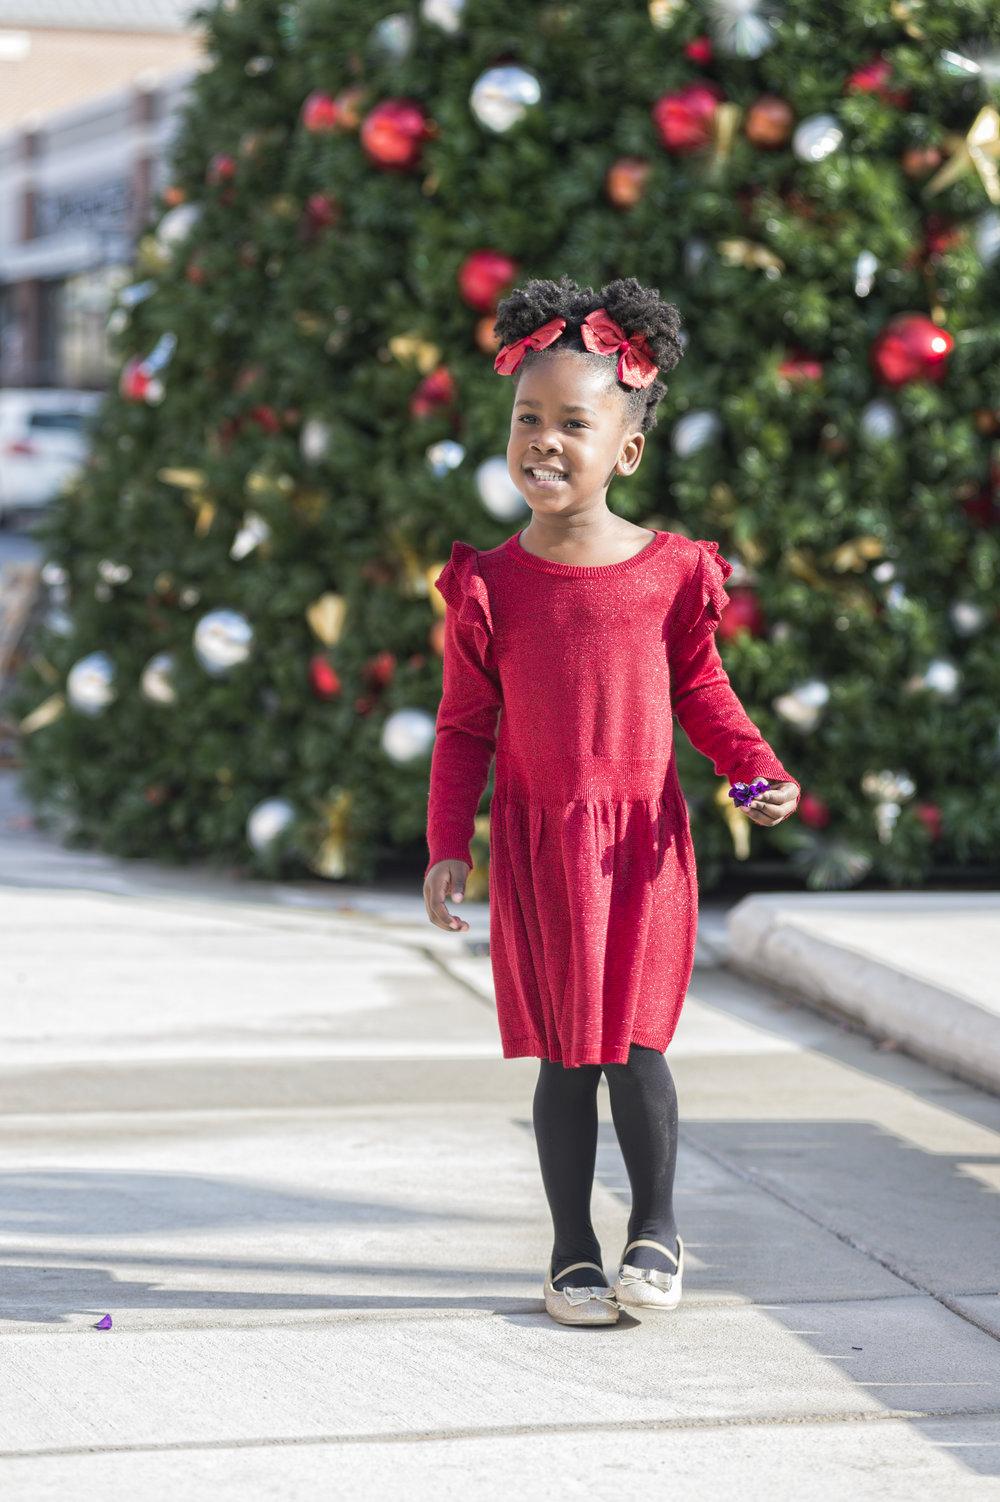 DSW-kids-holiday-style-aria-bolden3.JPG